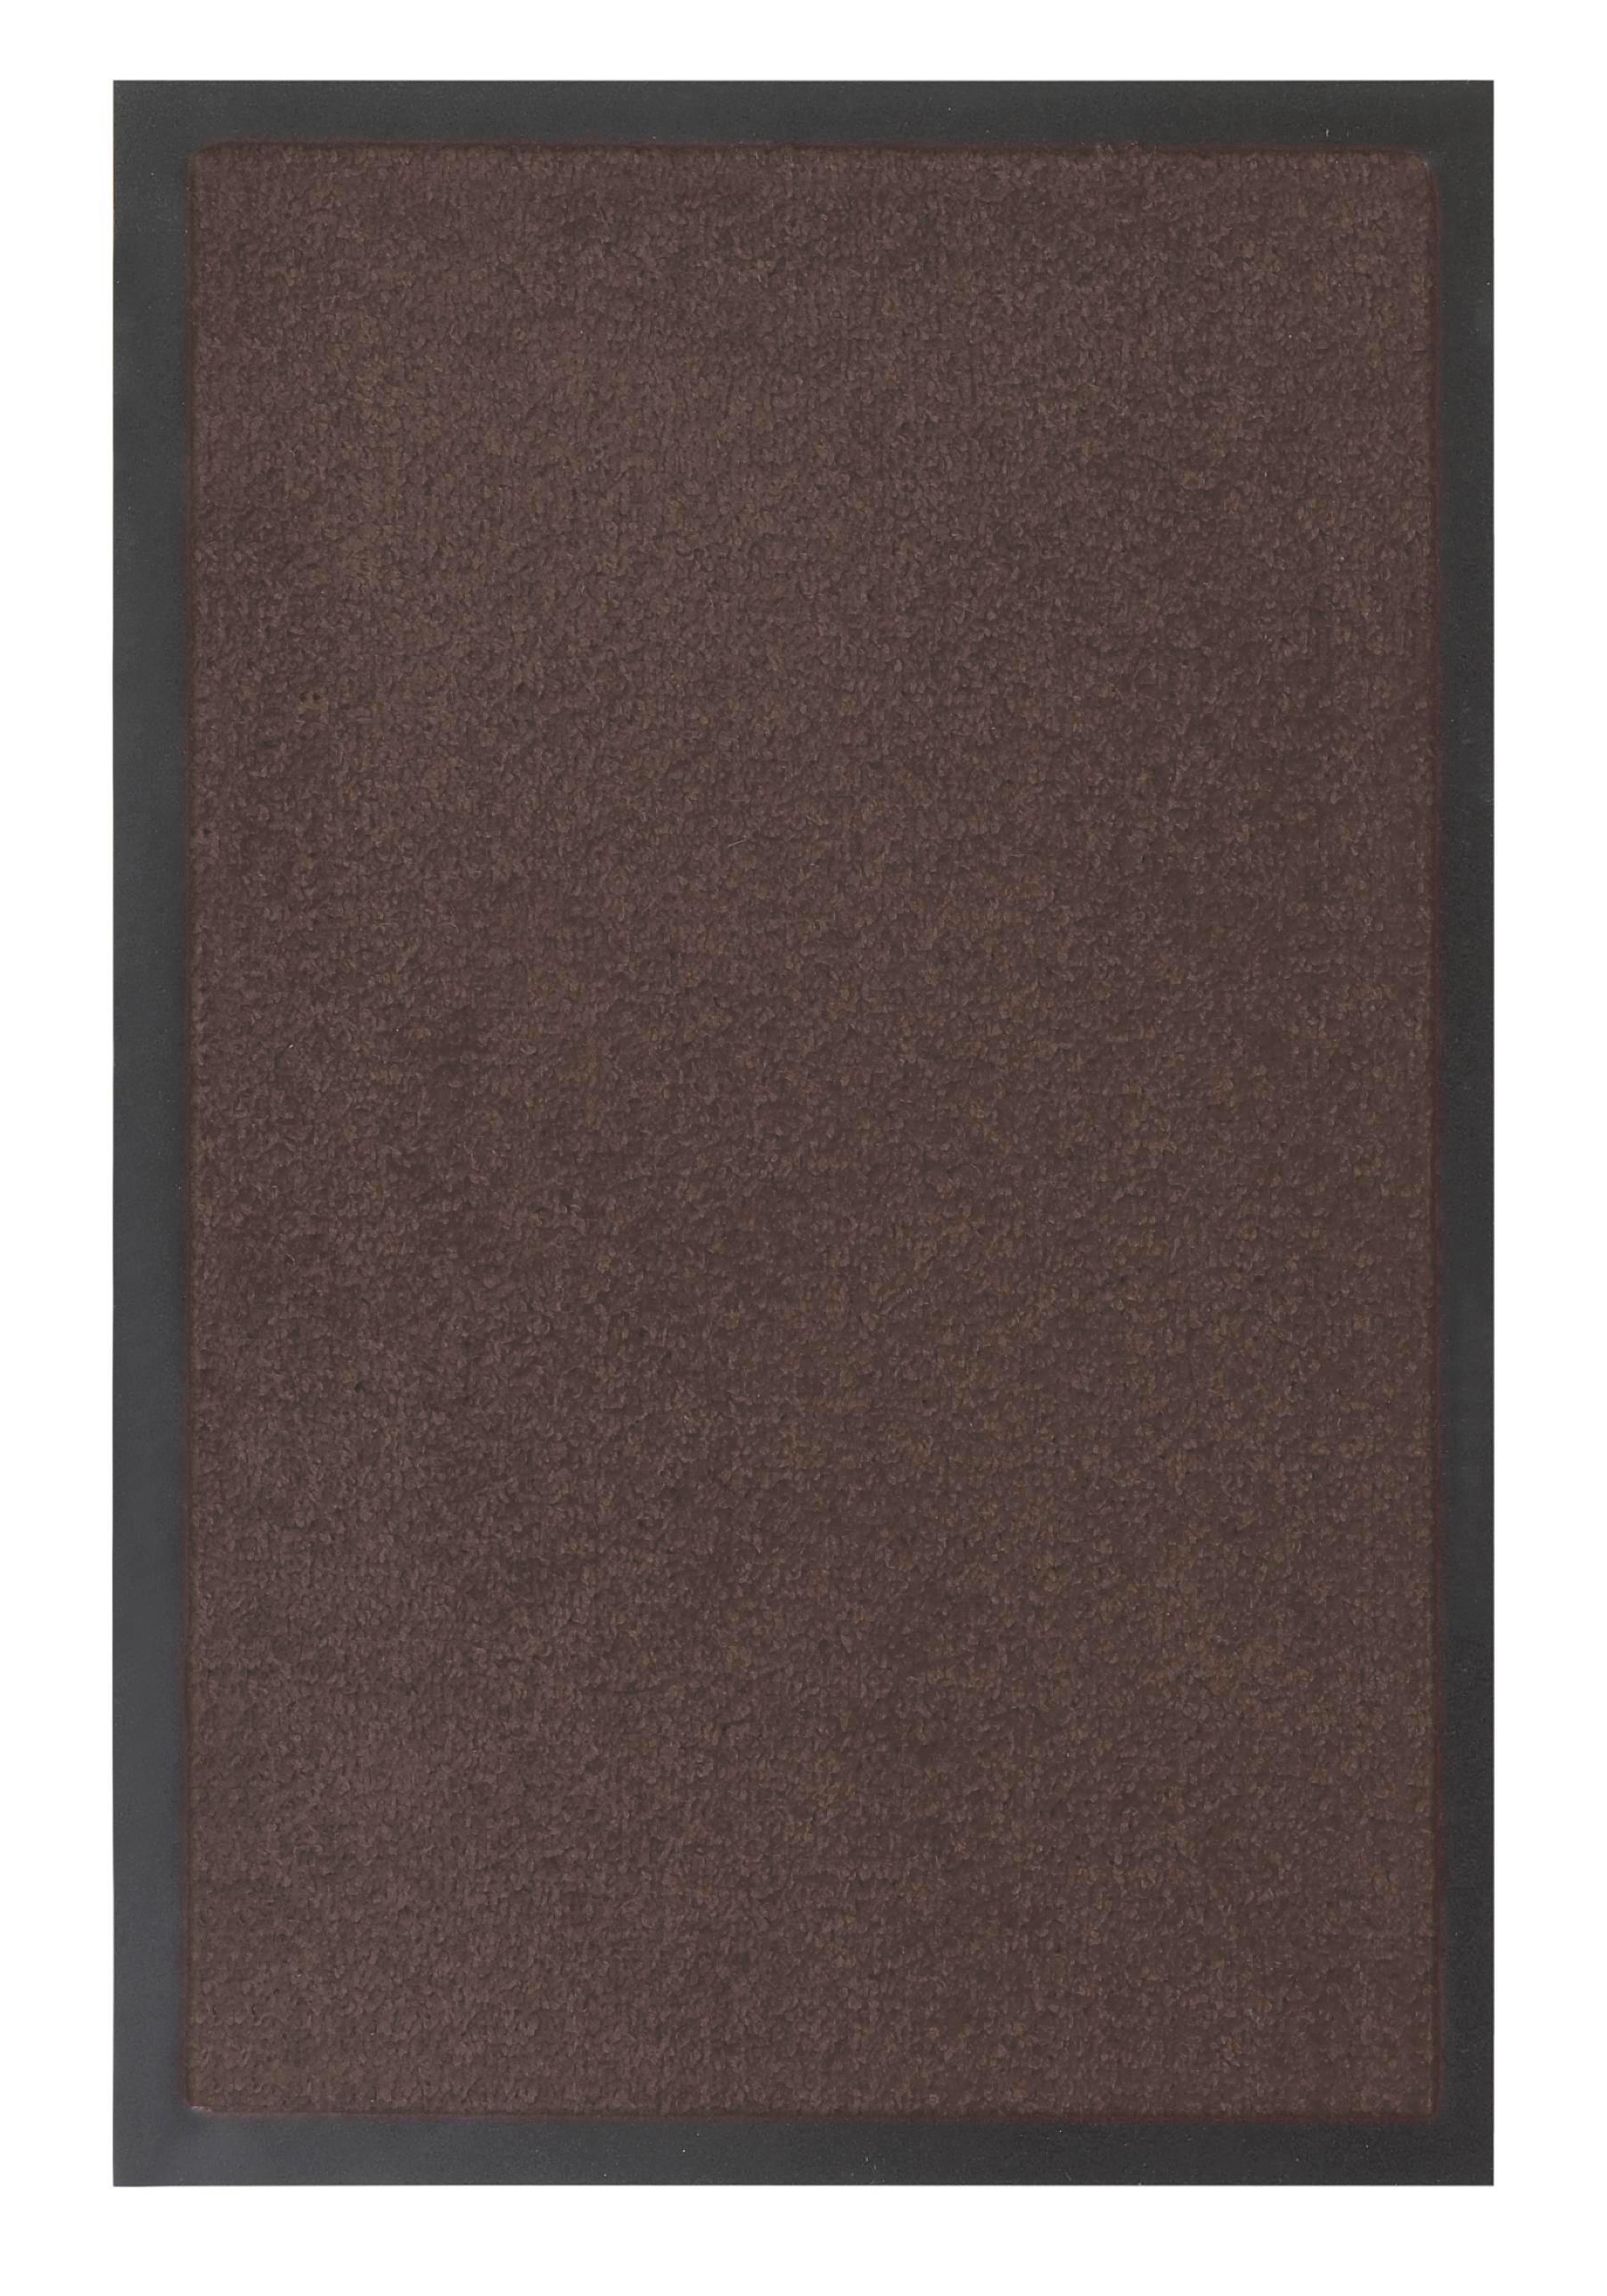 Predpražnik Eton - rjava, Trendi, tekstil (60/80cm) - ESPOSA